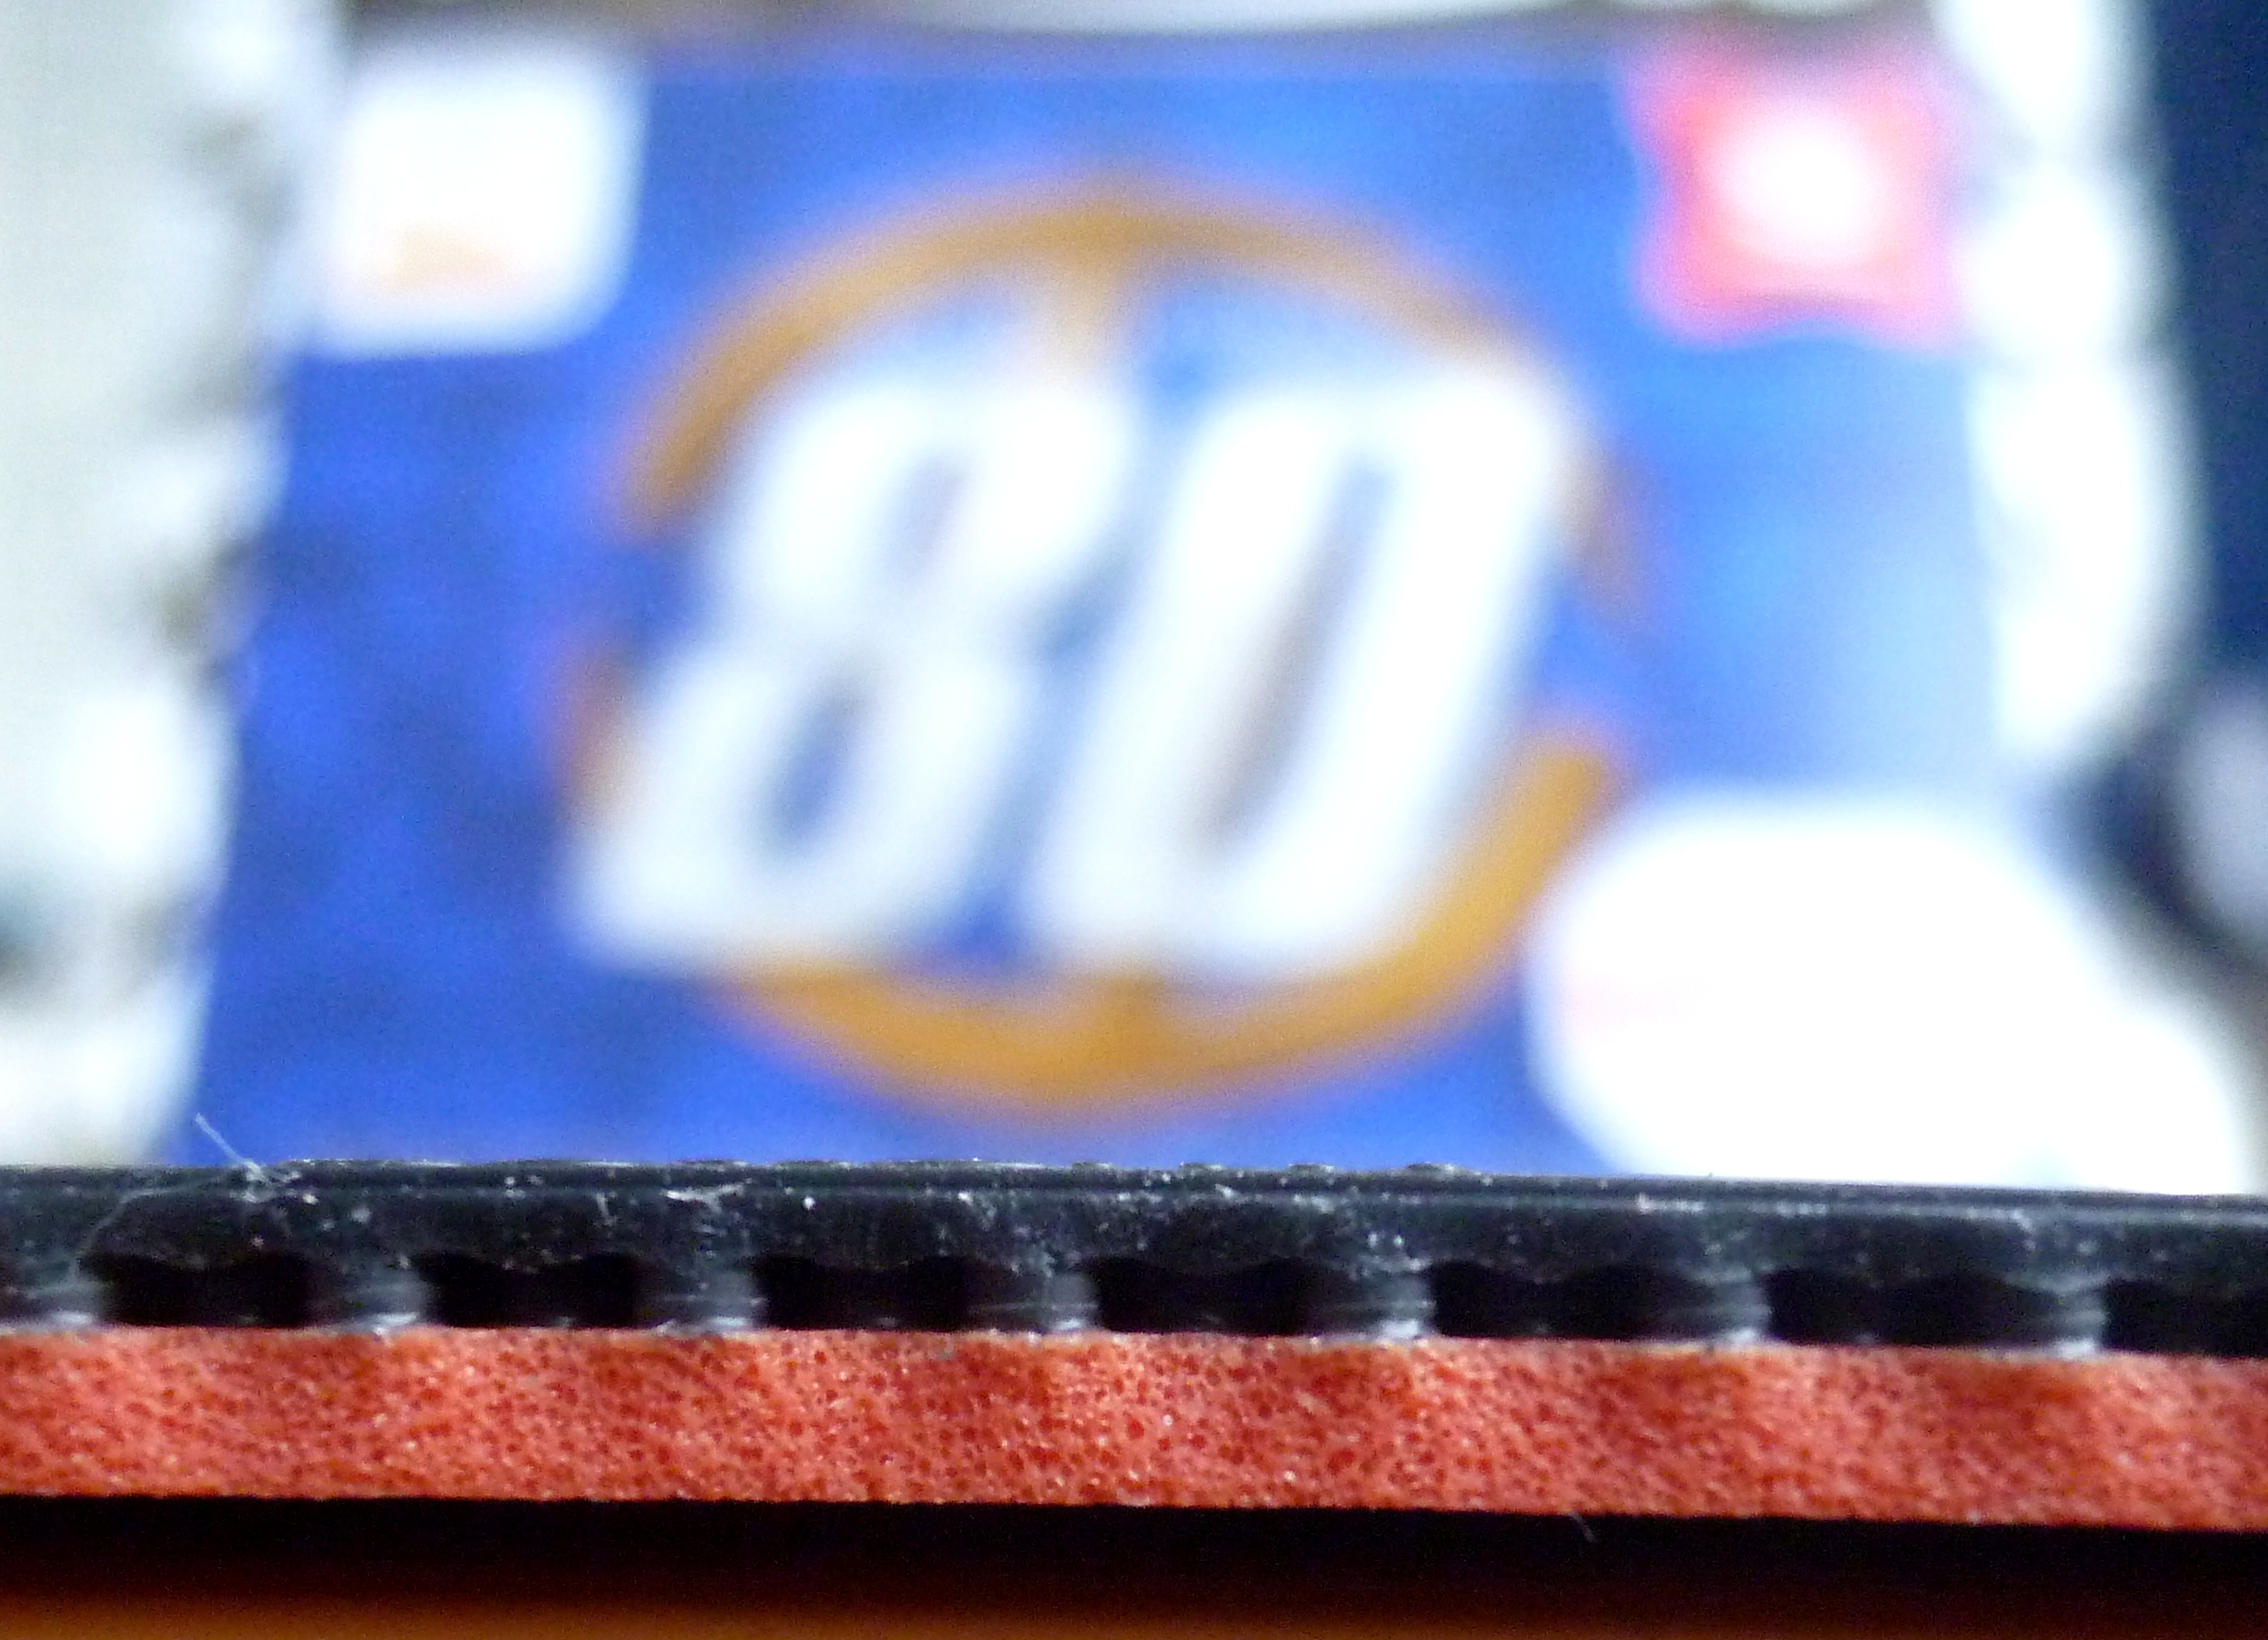 P1020508.JPG